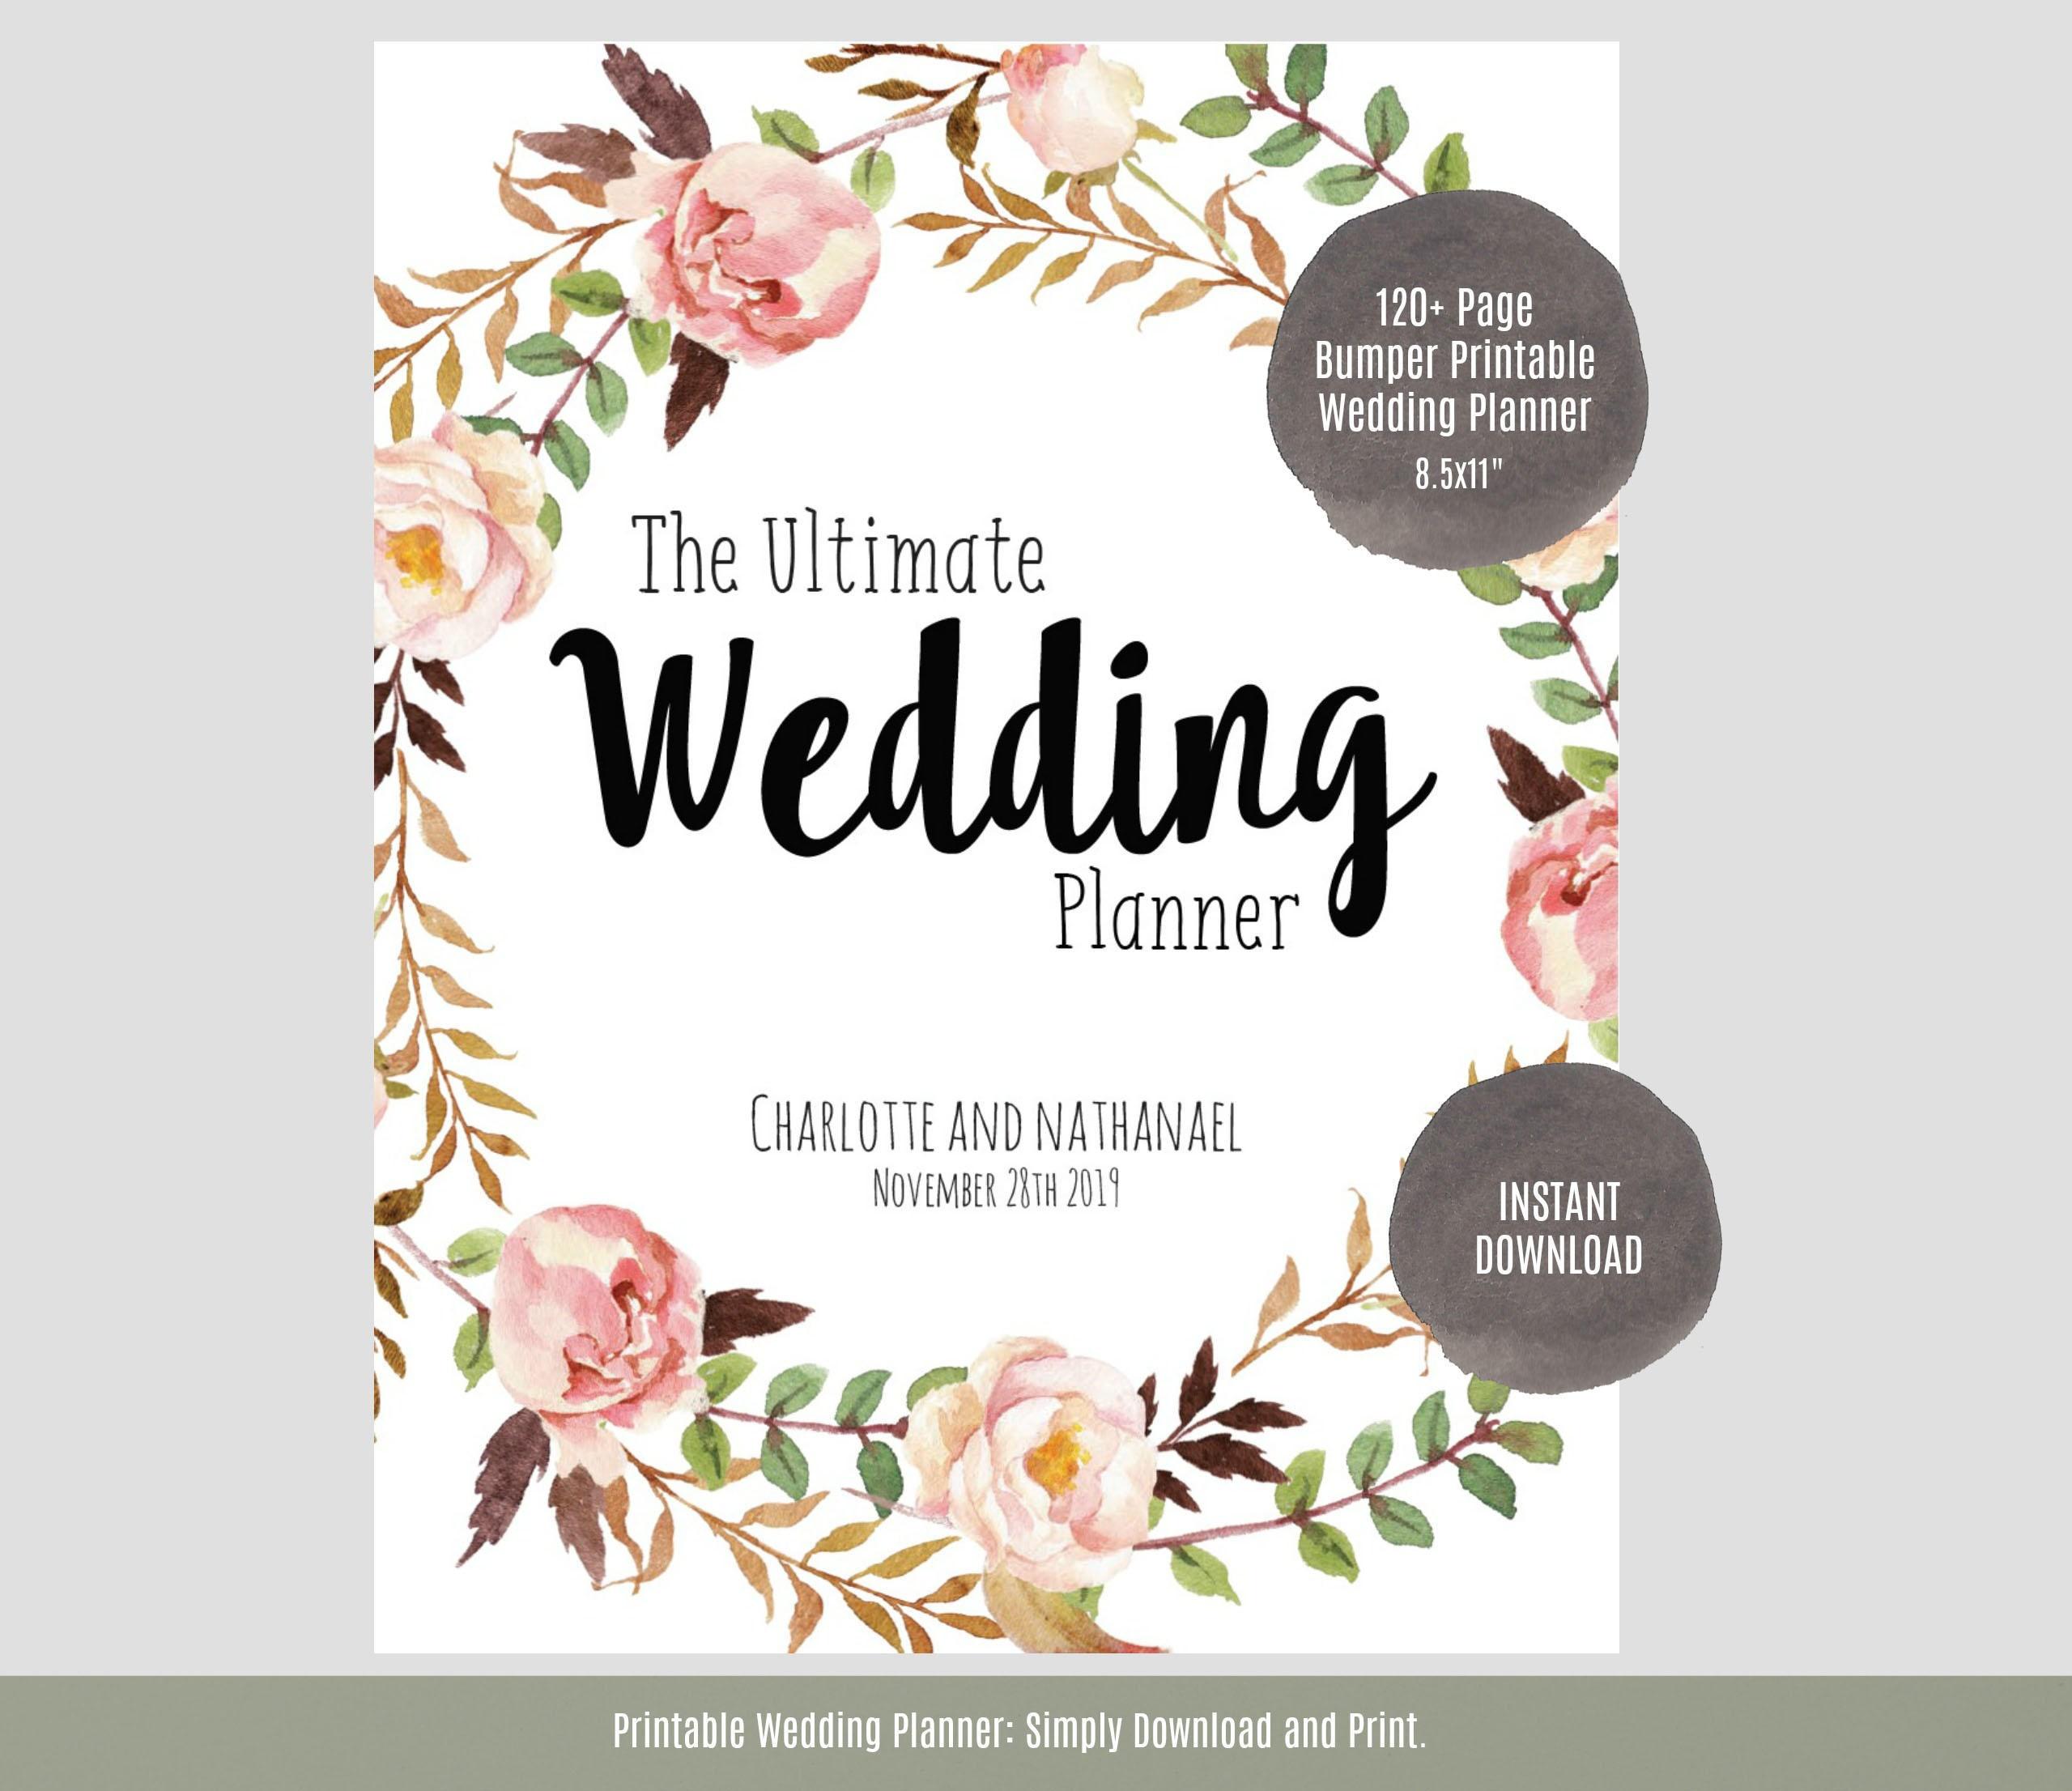 Gifts For Wedding Planner: Wedding Planner Printable Wedding Planner Wedding Binder